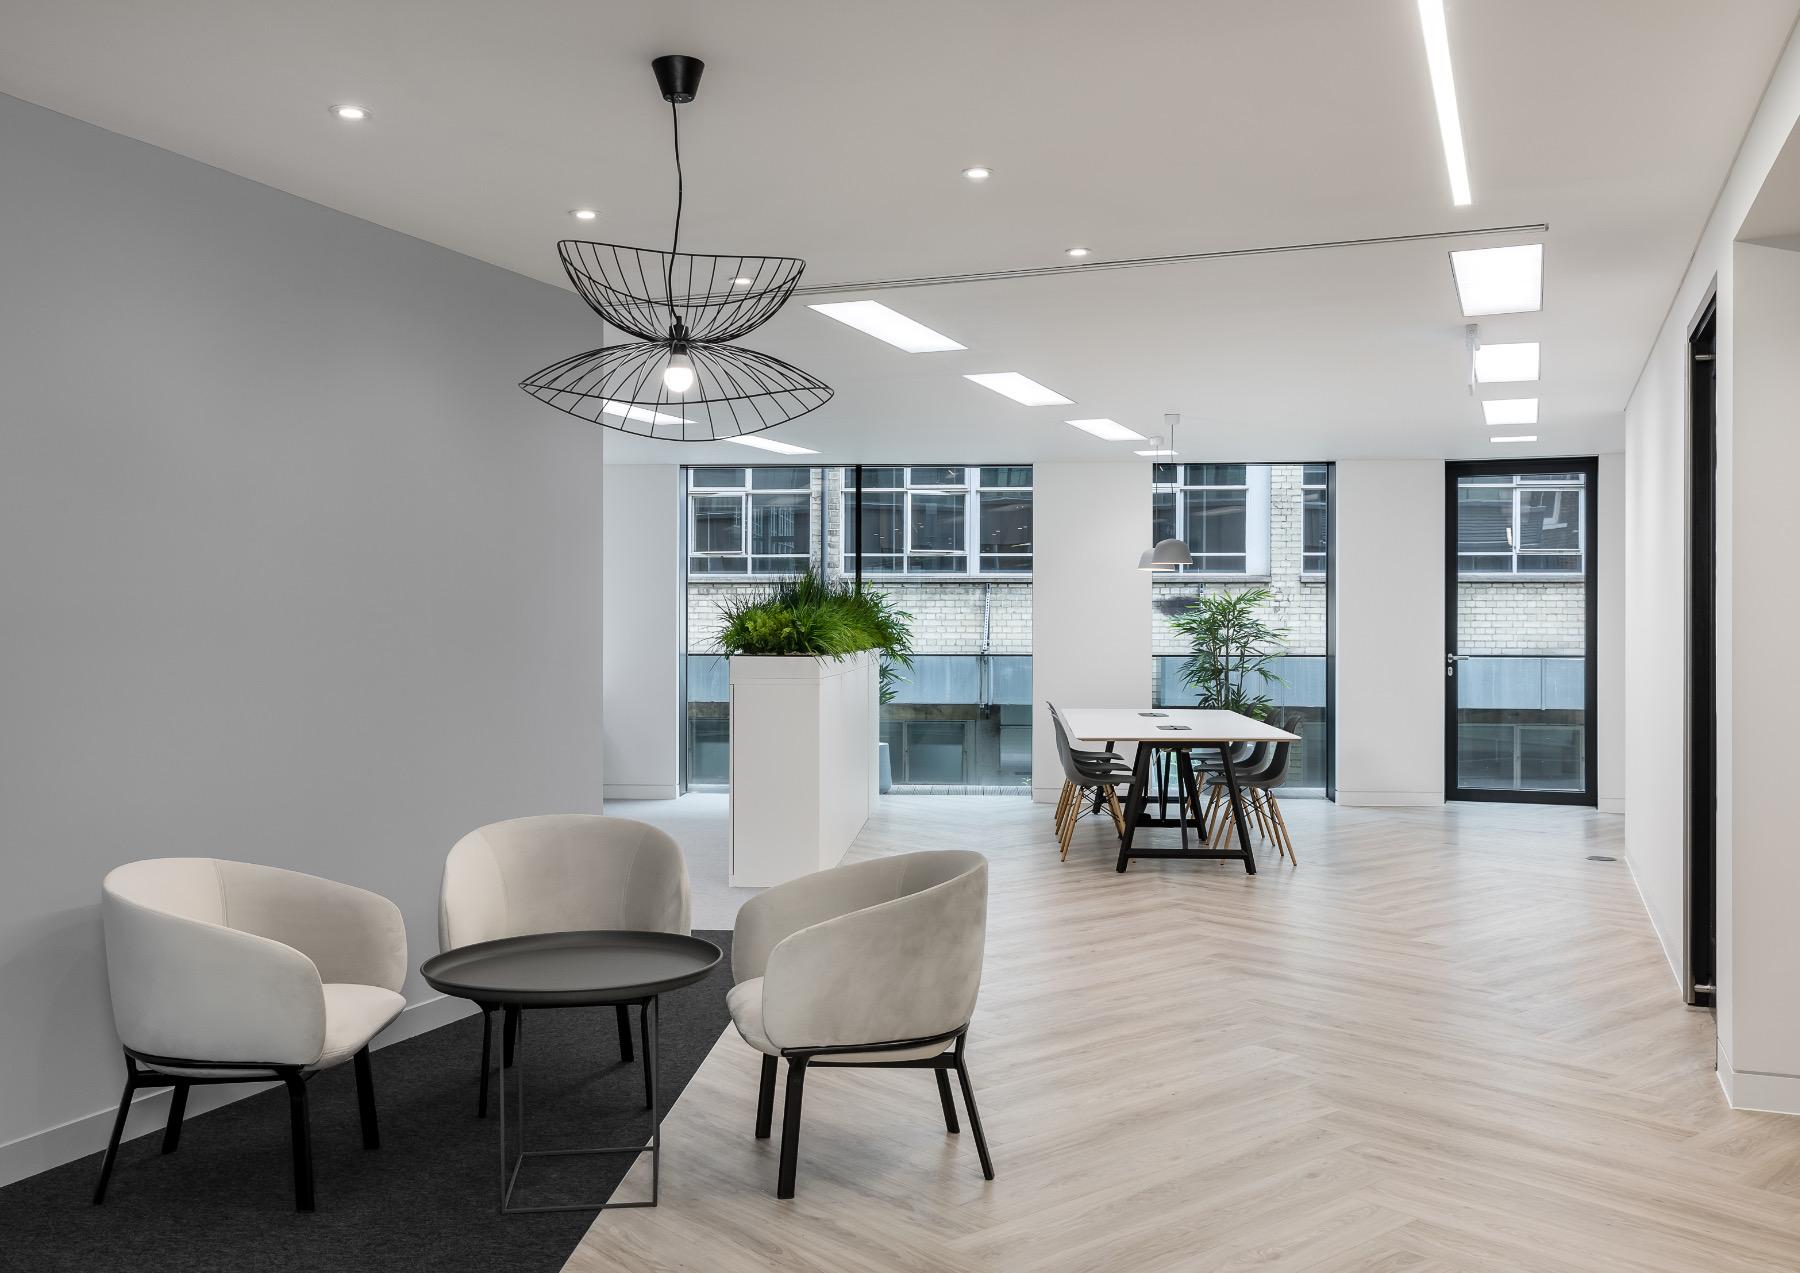 royal-london-office-4